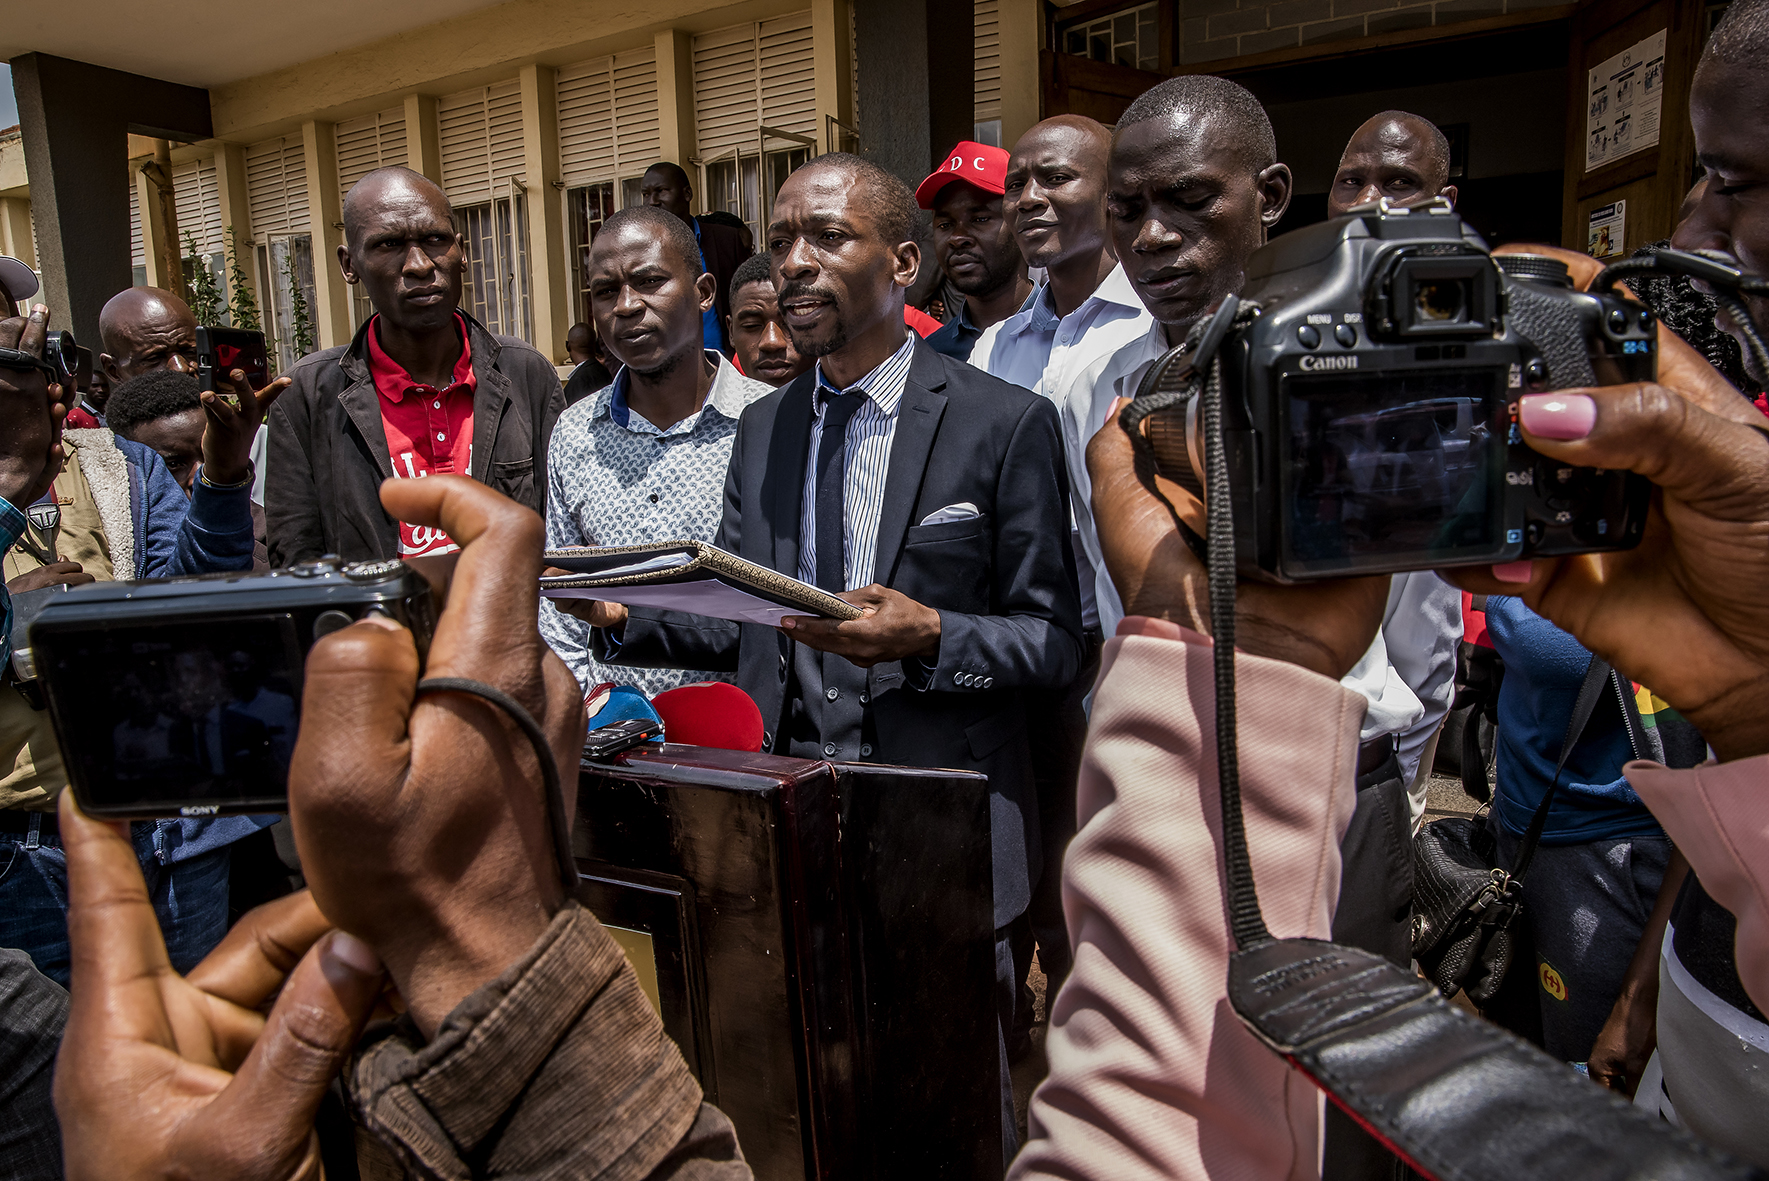 38 Nyanzi plea 20181109_123.jpg